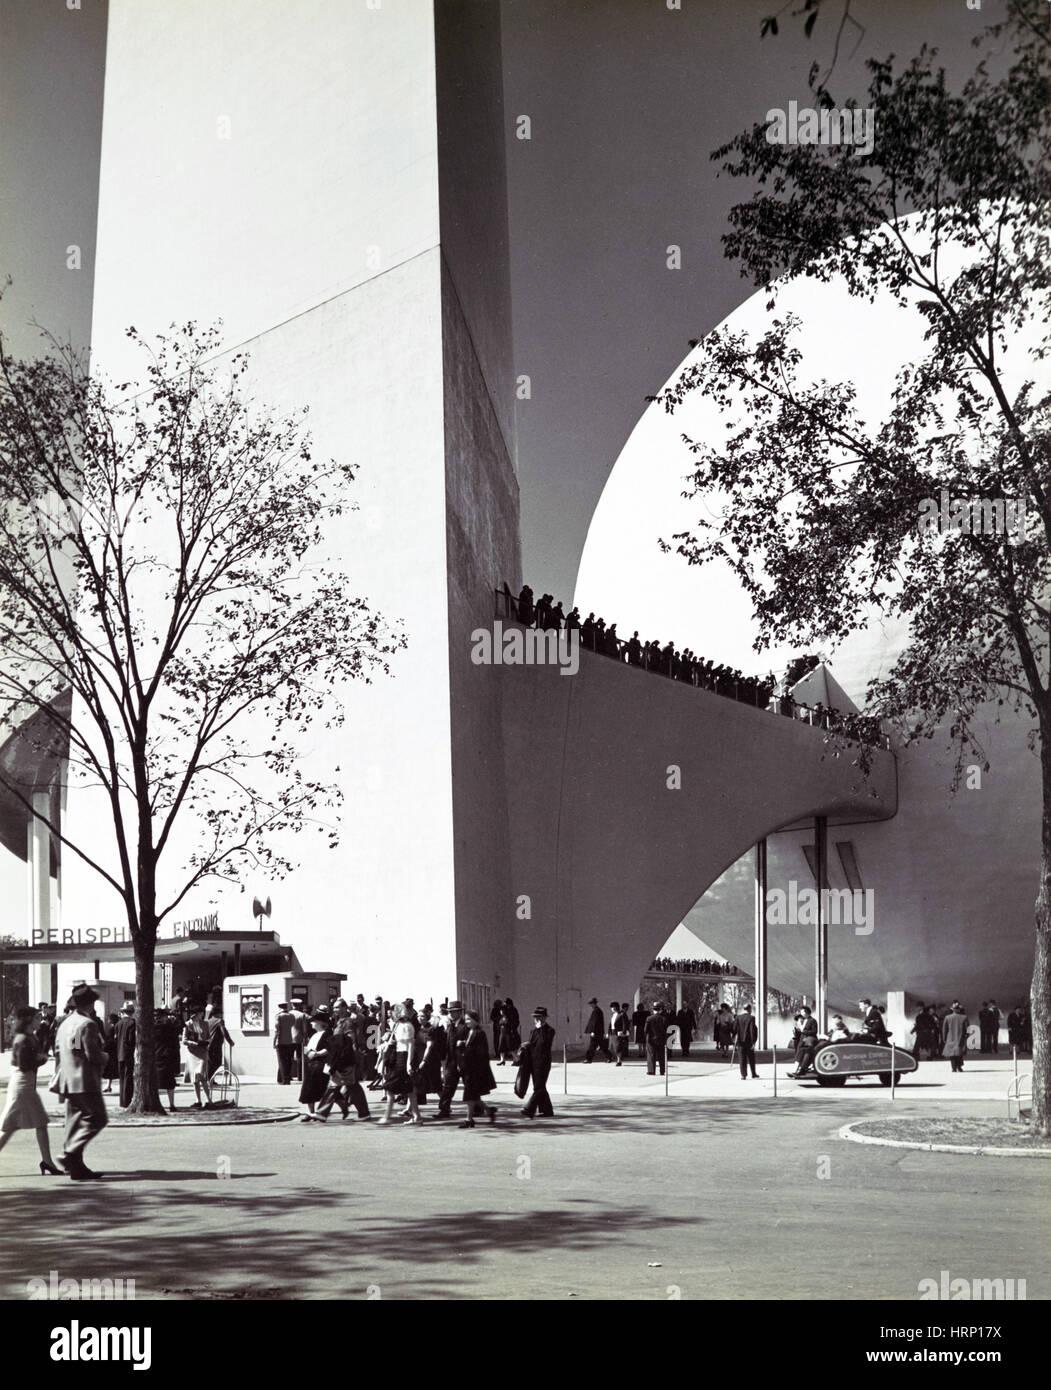 Perisphere Entrance, 1939 New York World's Fair - Stock Image